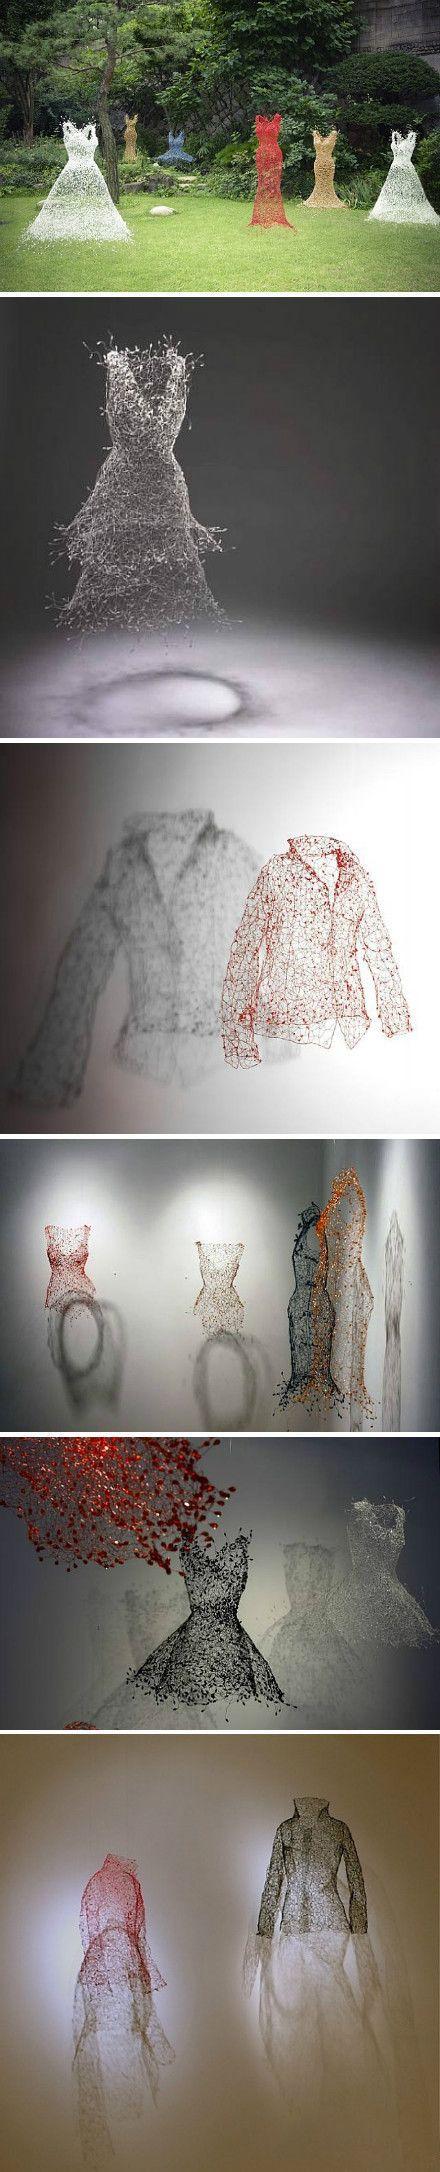 Korean artist Keysook Geum used iron wire to made this evening gown installations.#ContemporaryKoreanArt